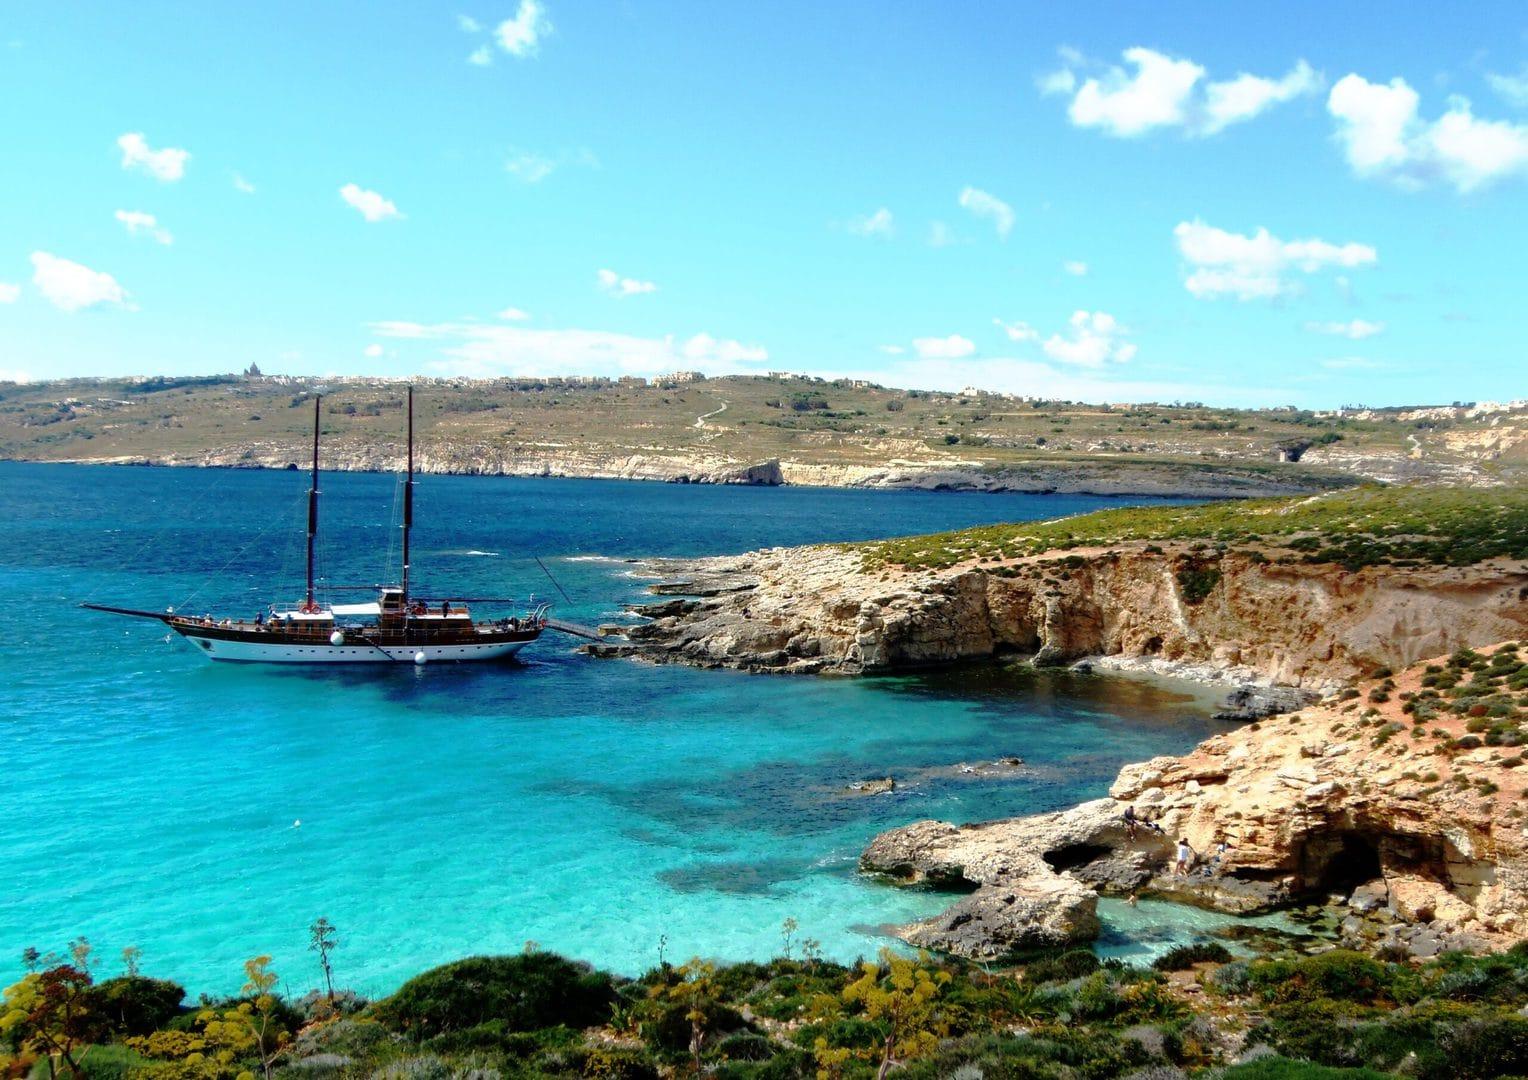 ParadiseBay_malta_kajak-studierejser